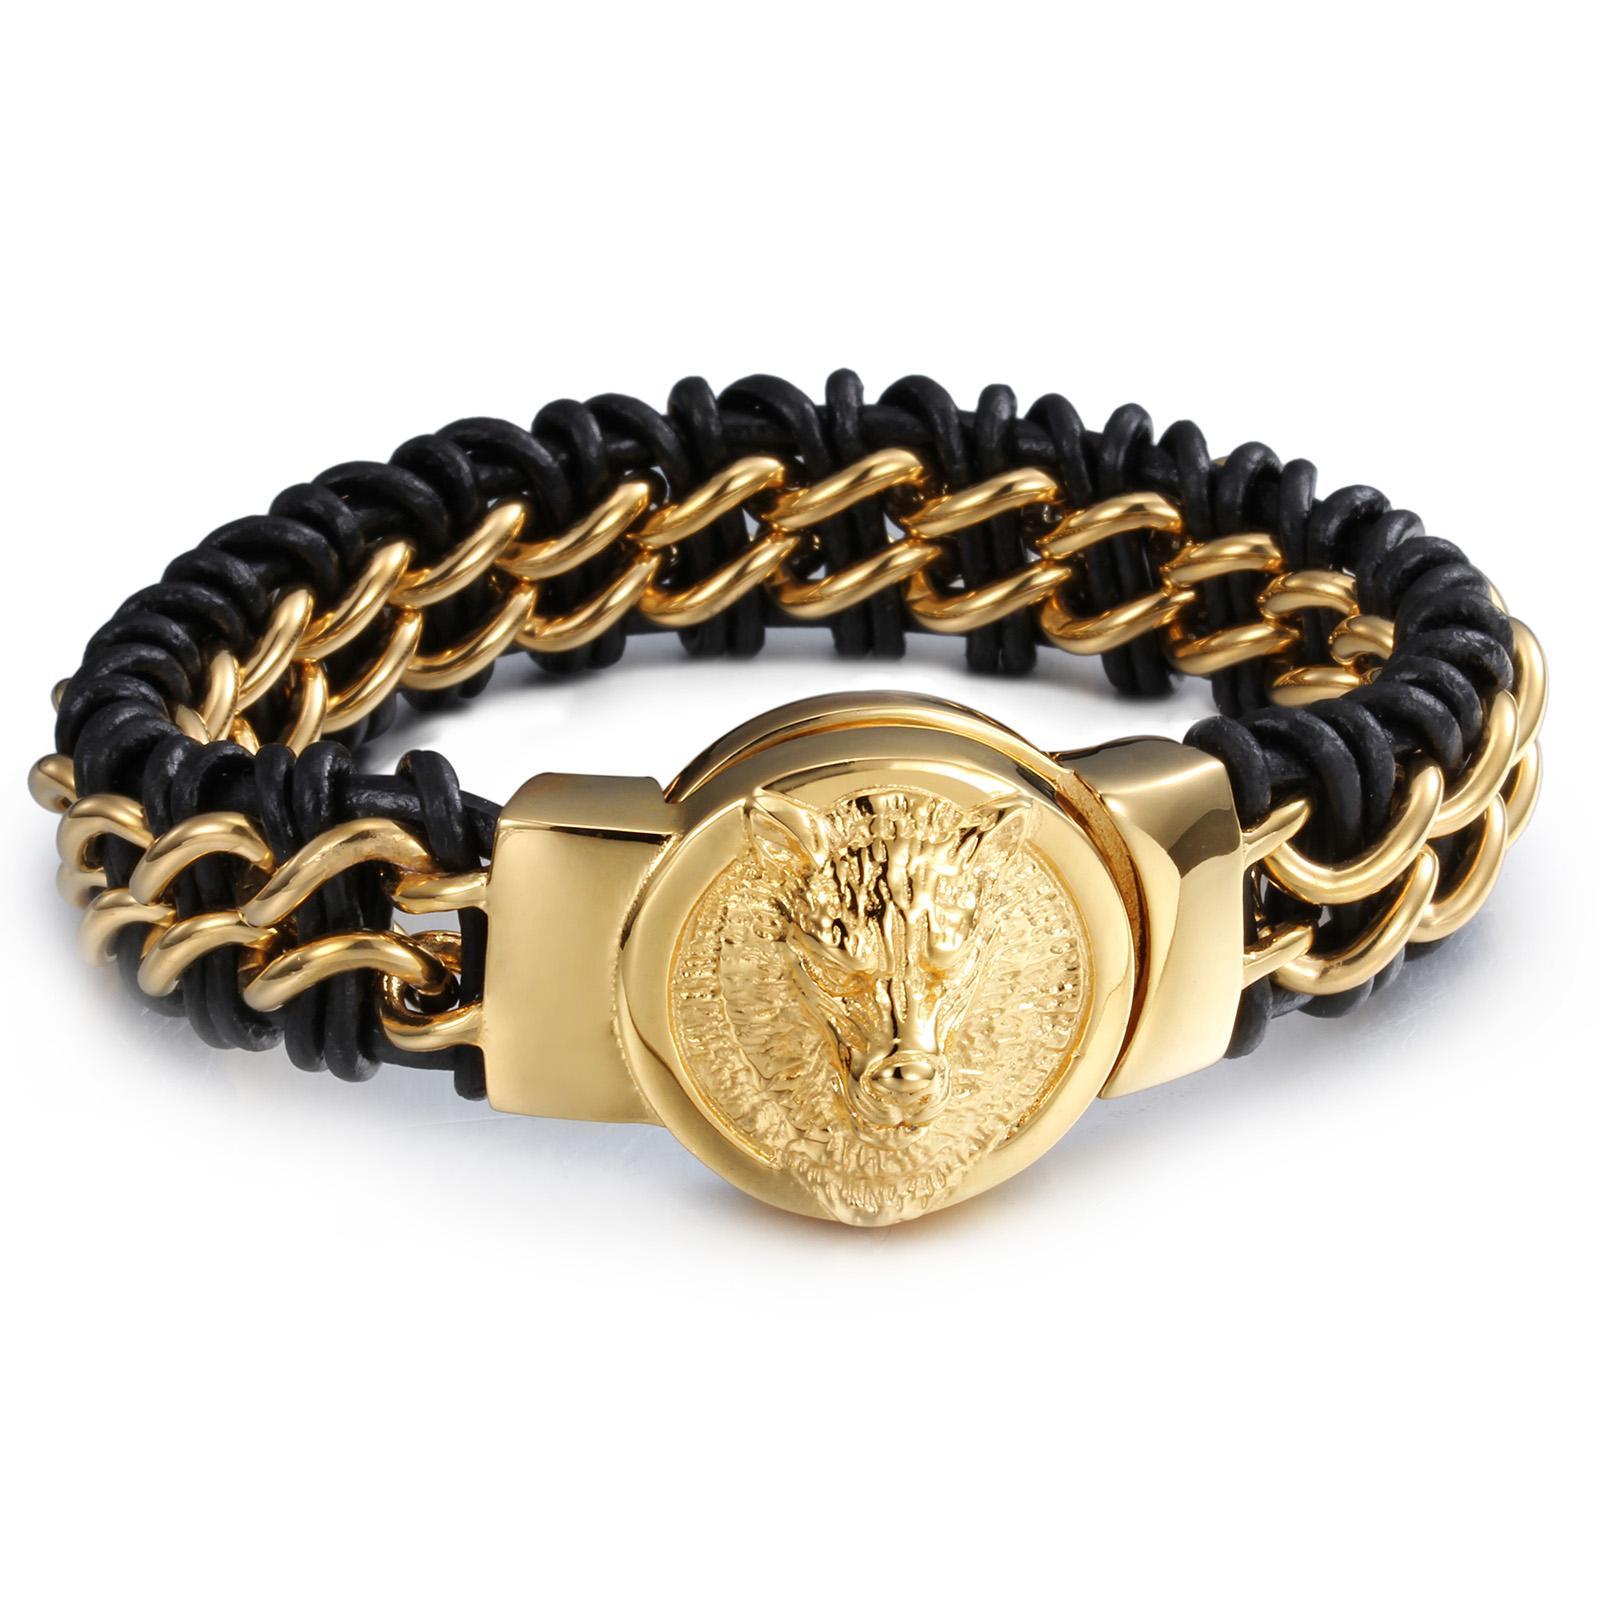 Hiphop New Punk Style 8.66'' 18mm Genuine Leather 316L Stainless Steel Biker Gold Wolf Head Design Men's Bracelet Bangle